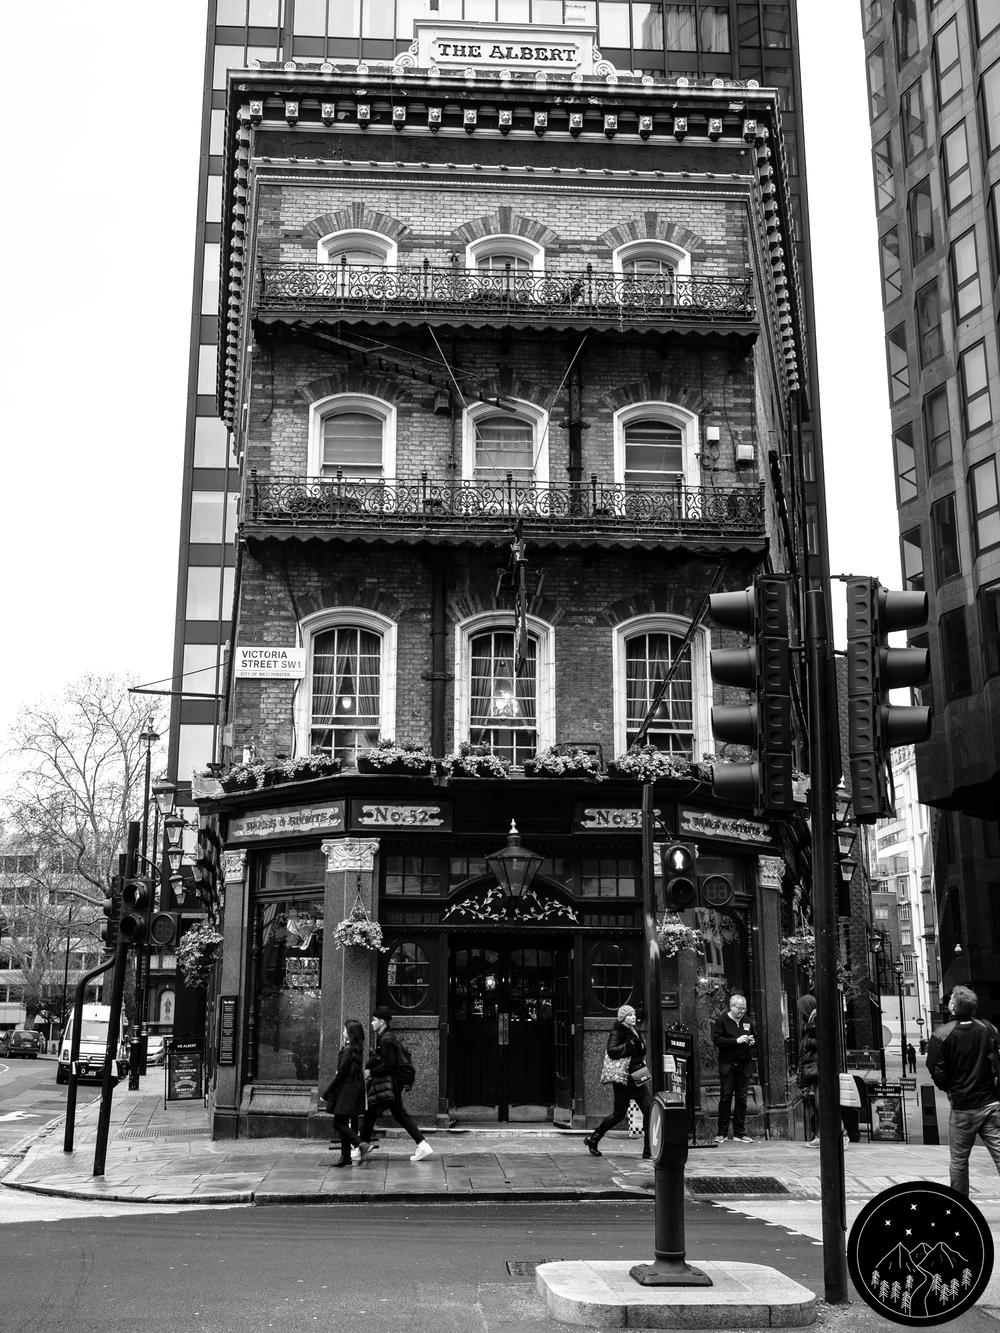 Image Description: The Albert pub on Victoria Street, London